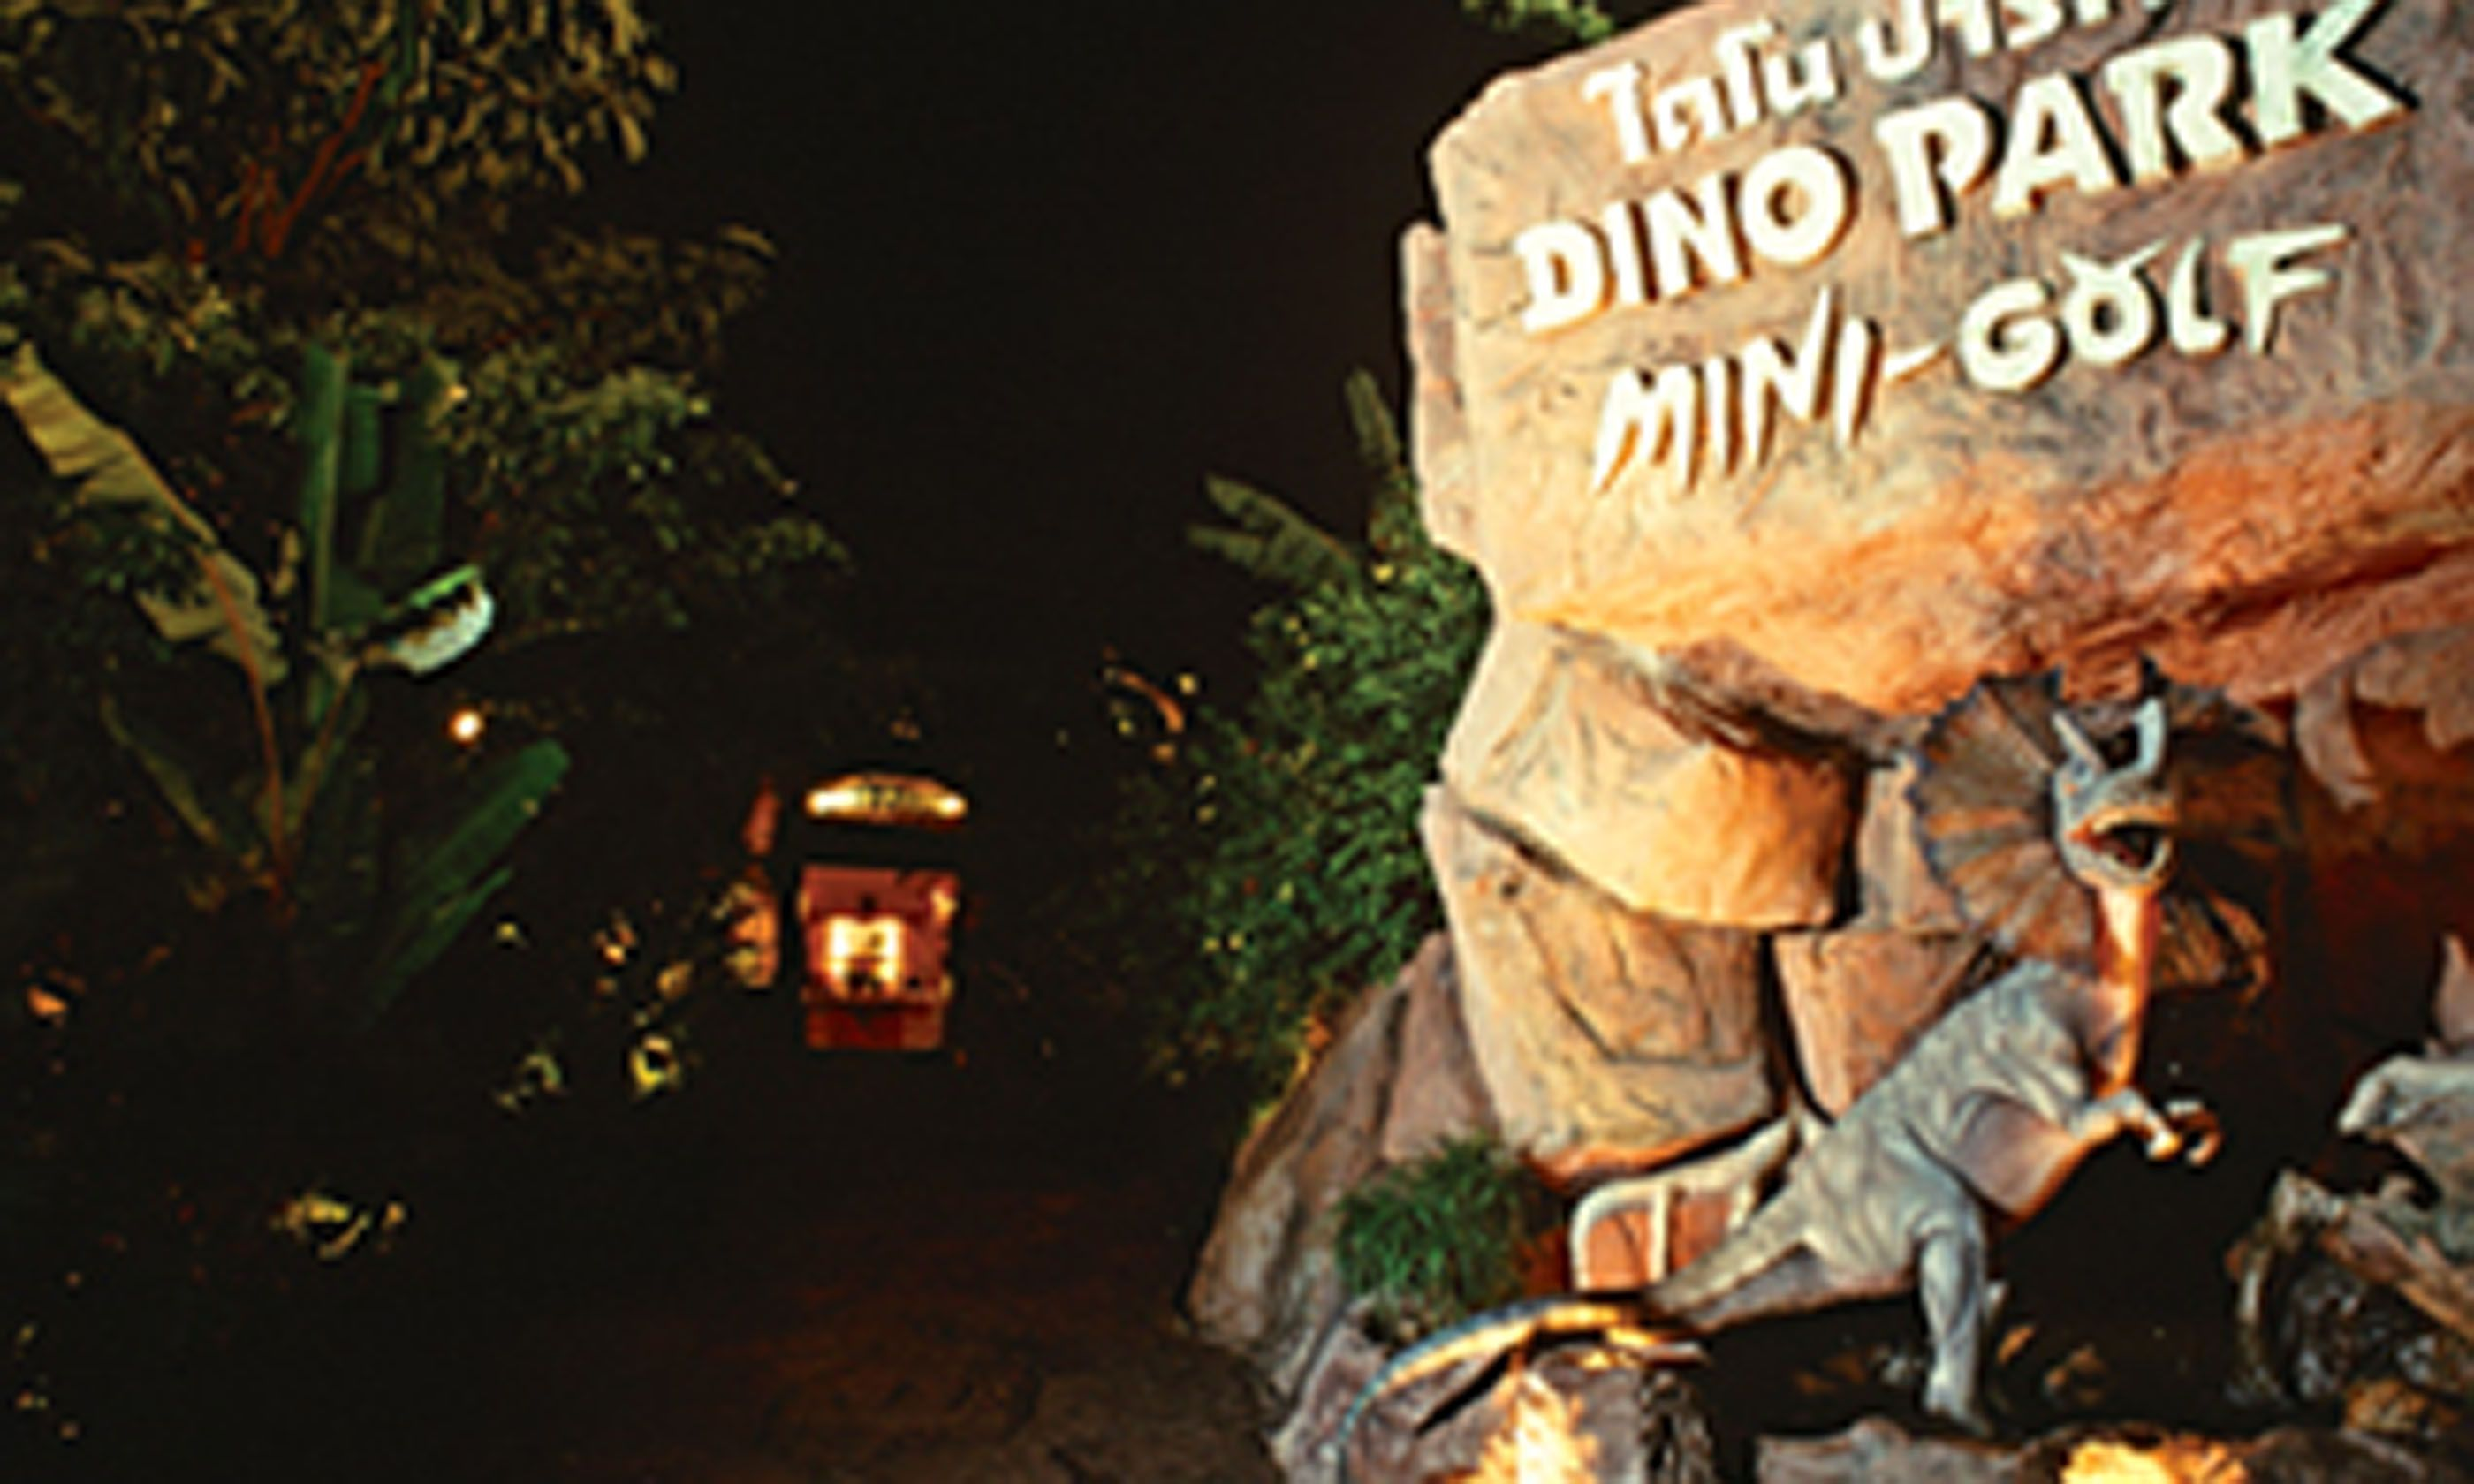 Jurassic Mini Golf (dinopark.com)